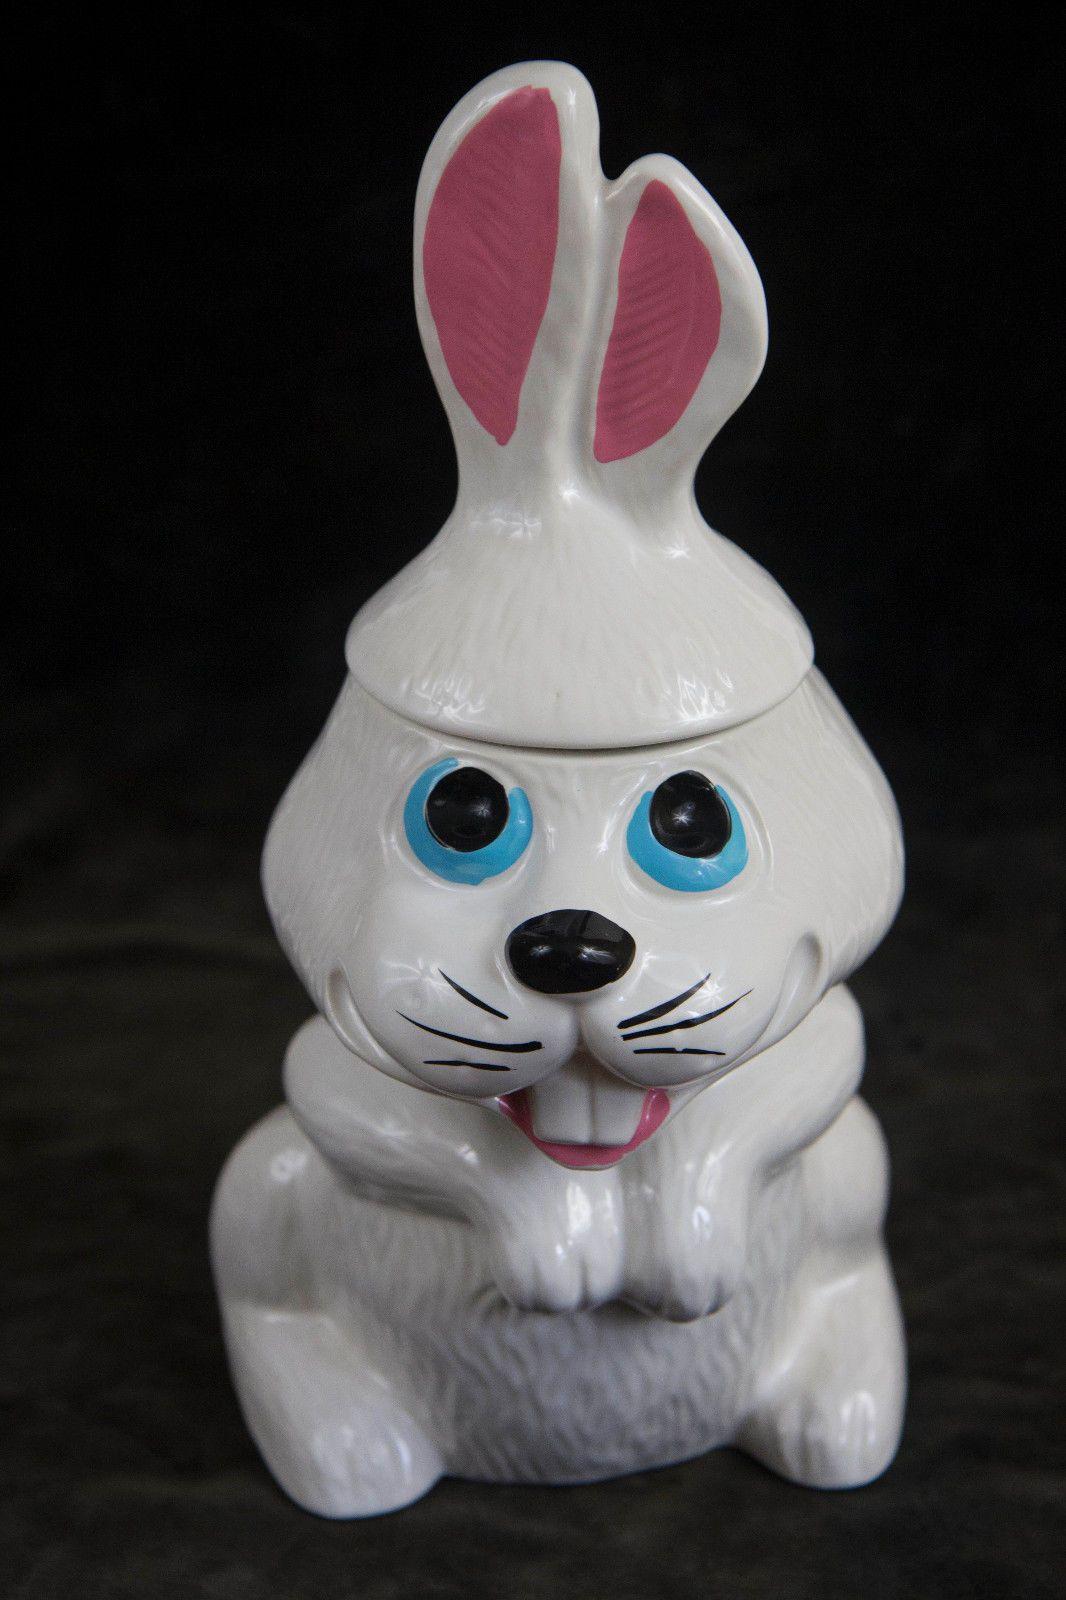 Mccoy Cookie Jar Values Endearing Vintage Mccoy Cookie Jar Hocus Rabbit Bunny Orig Box  Cookie Inspiration Design